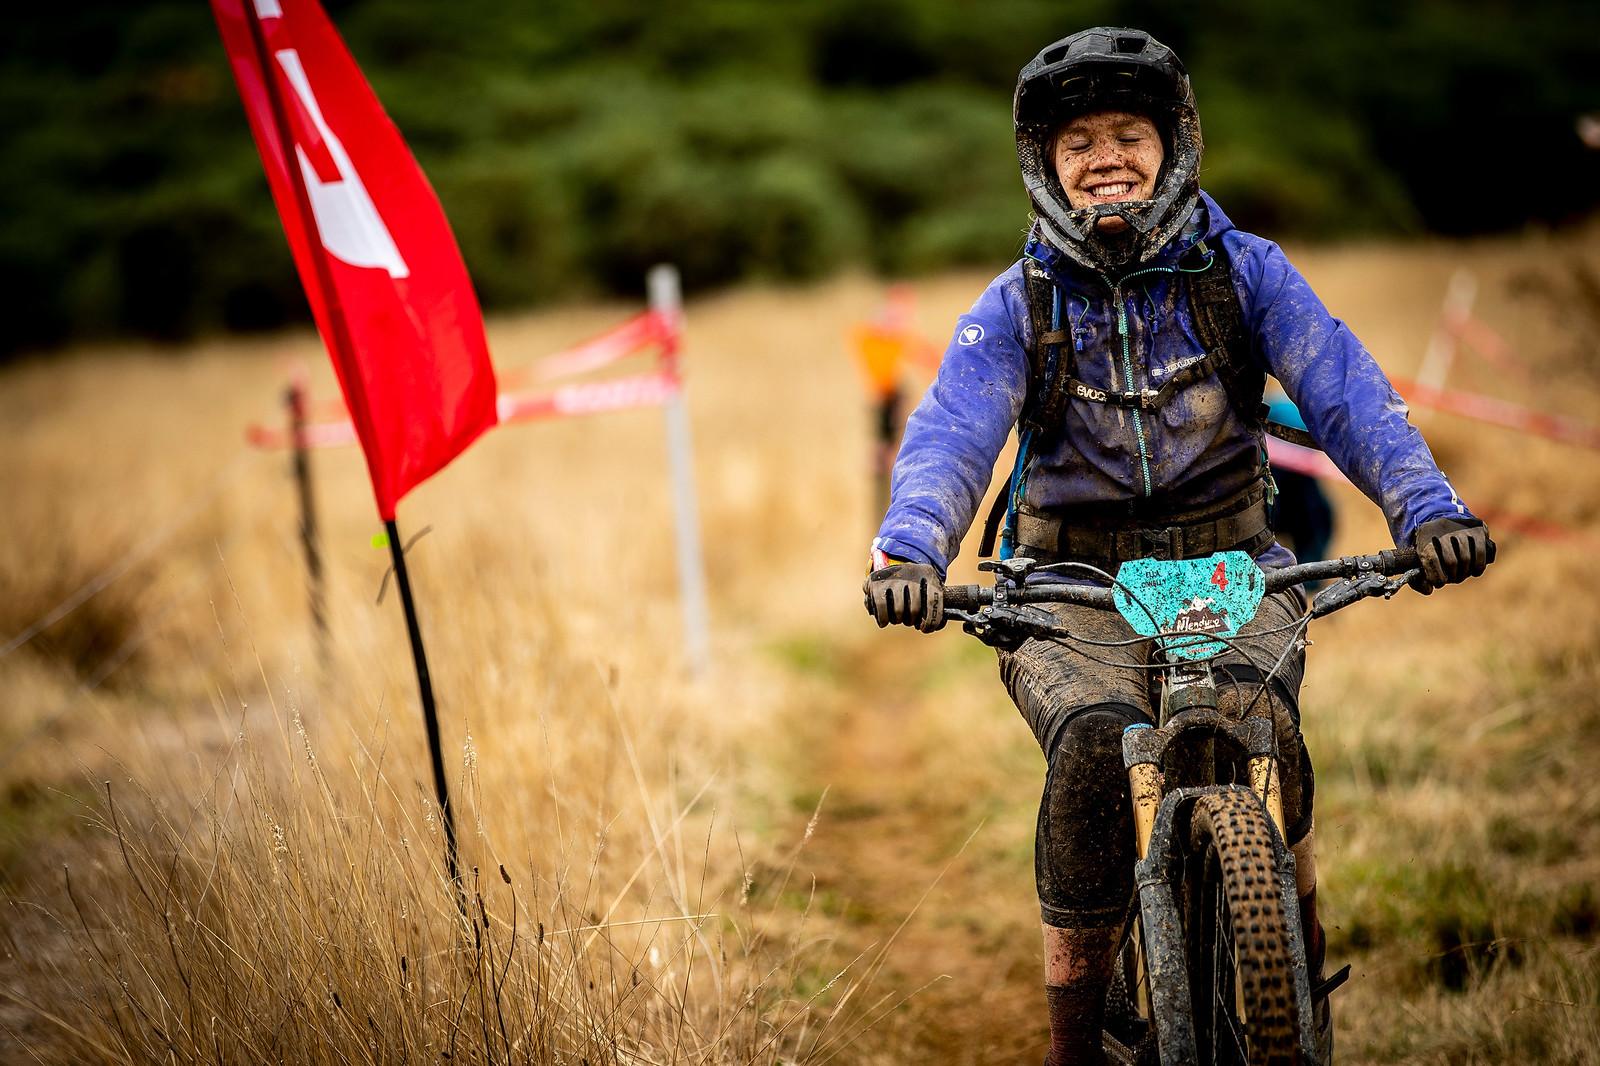 NZEnduro19  m1 8754 - 2019 NZ Enduro Day 2 Photo Gallery - Mountain Biking Pictures - Vital MTB